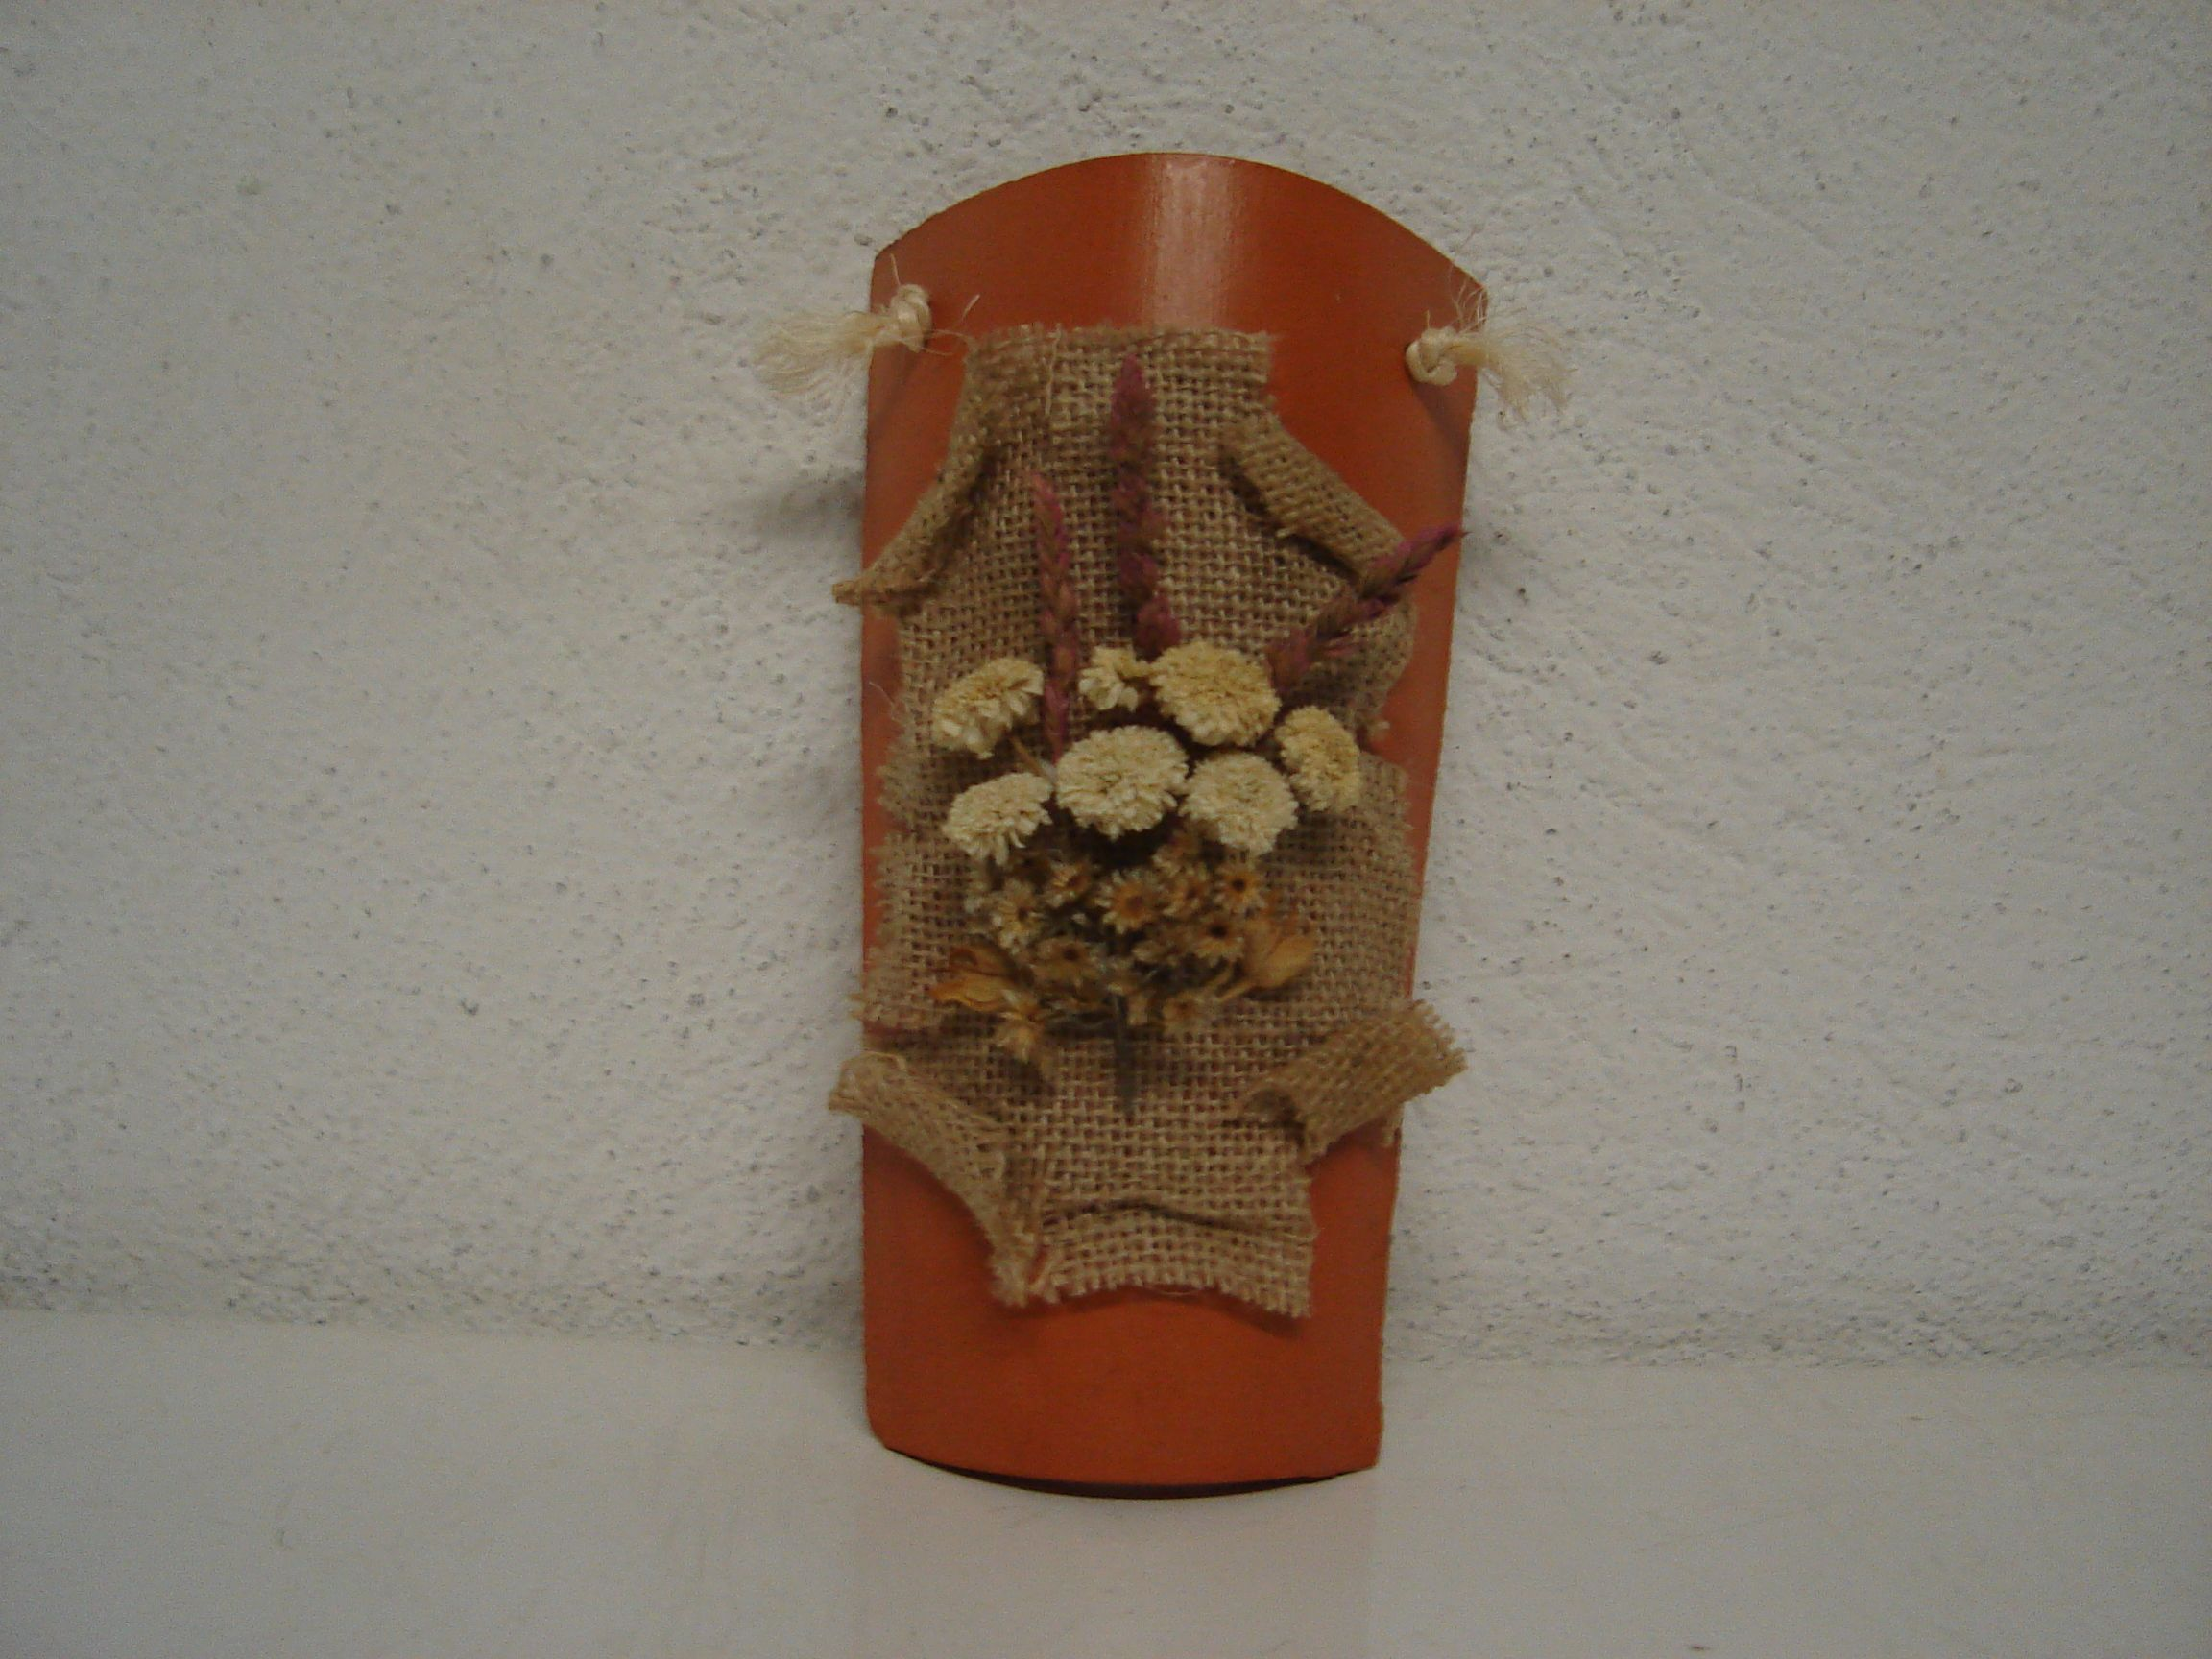 Enlace decorar teja con flores secas Ideas Pinterest